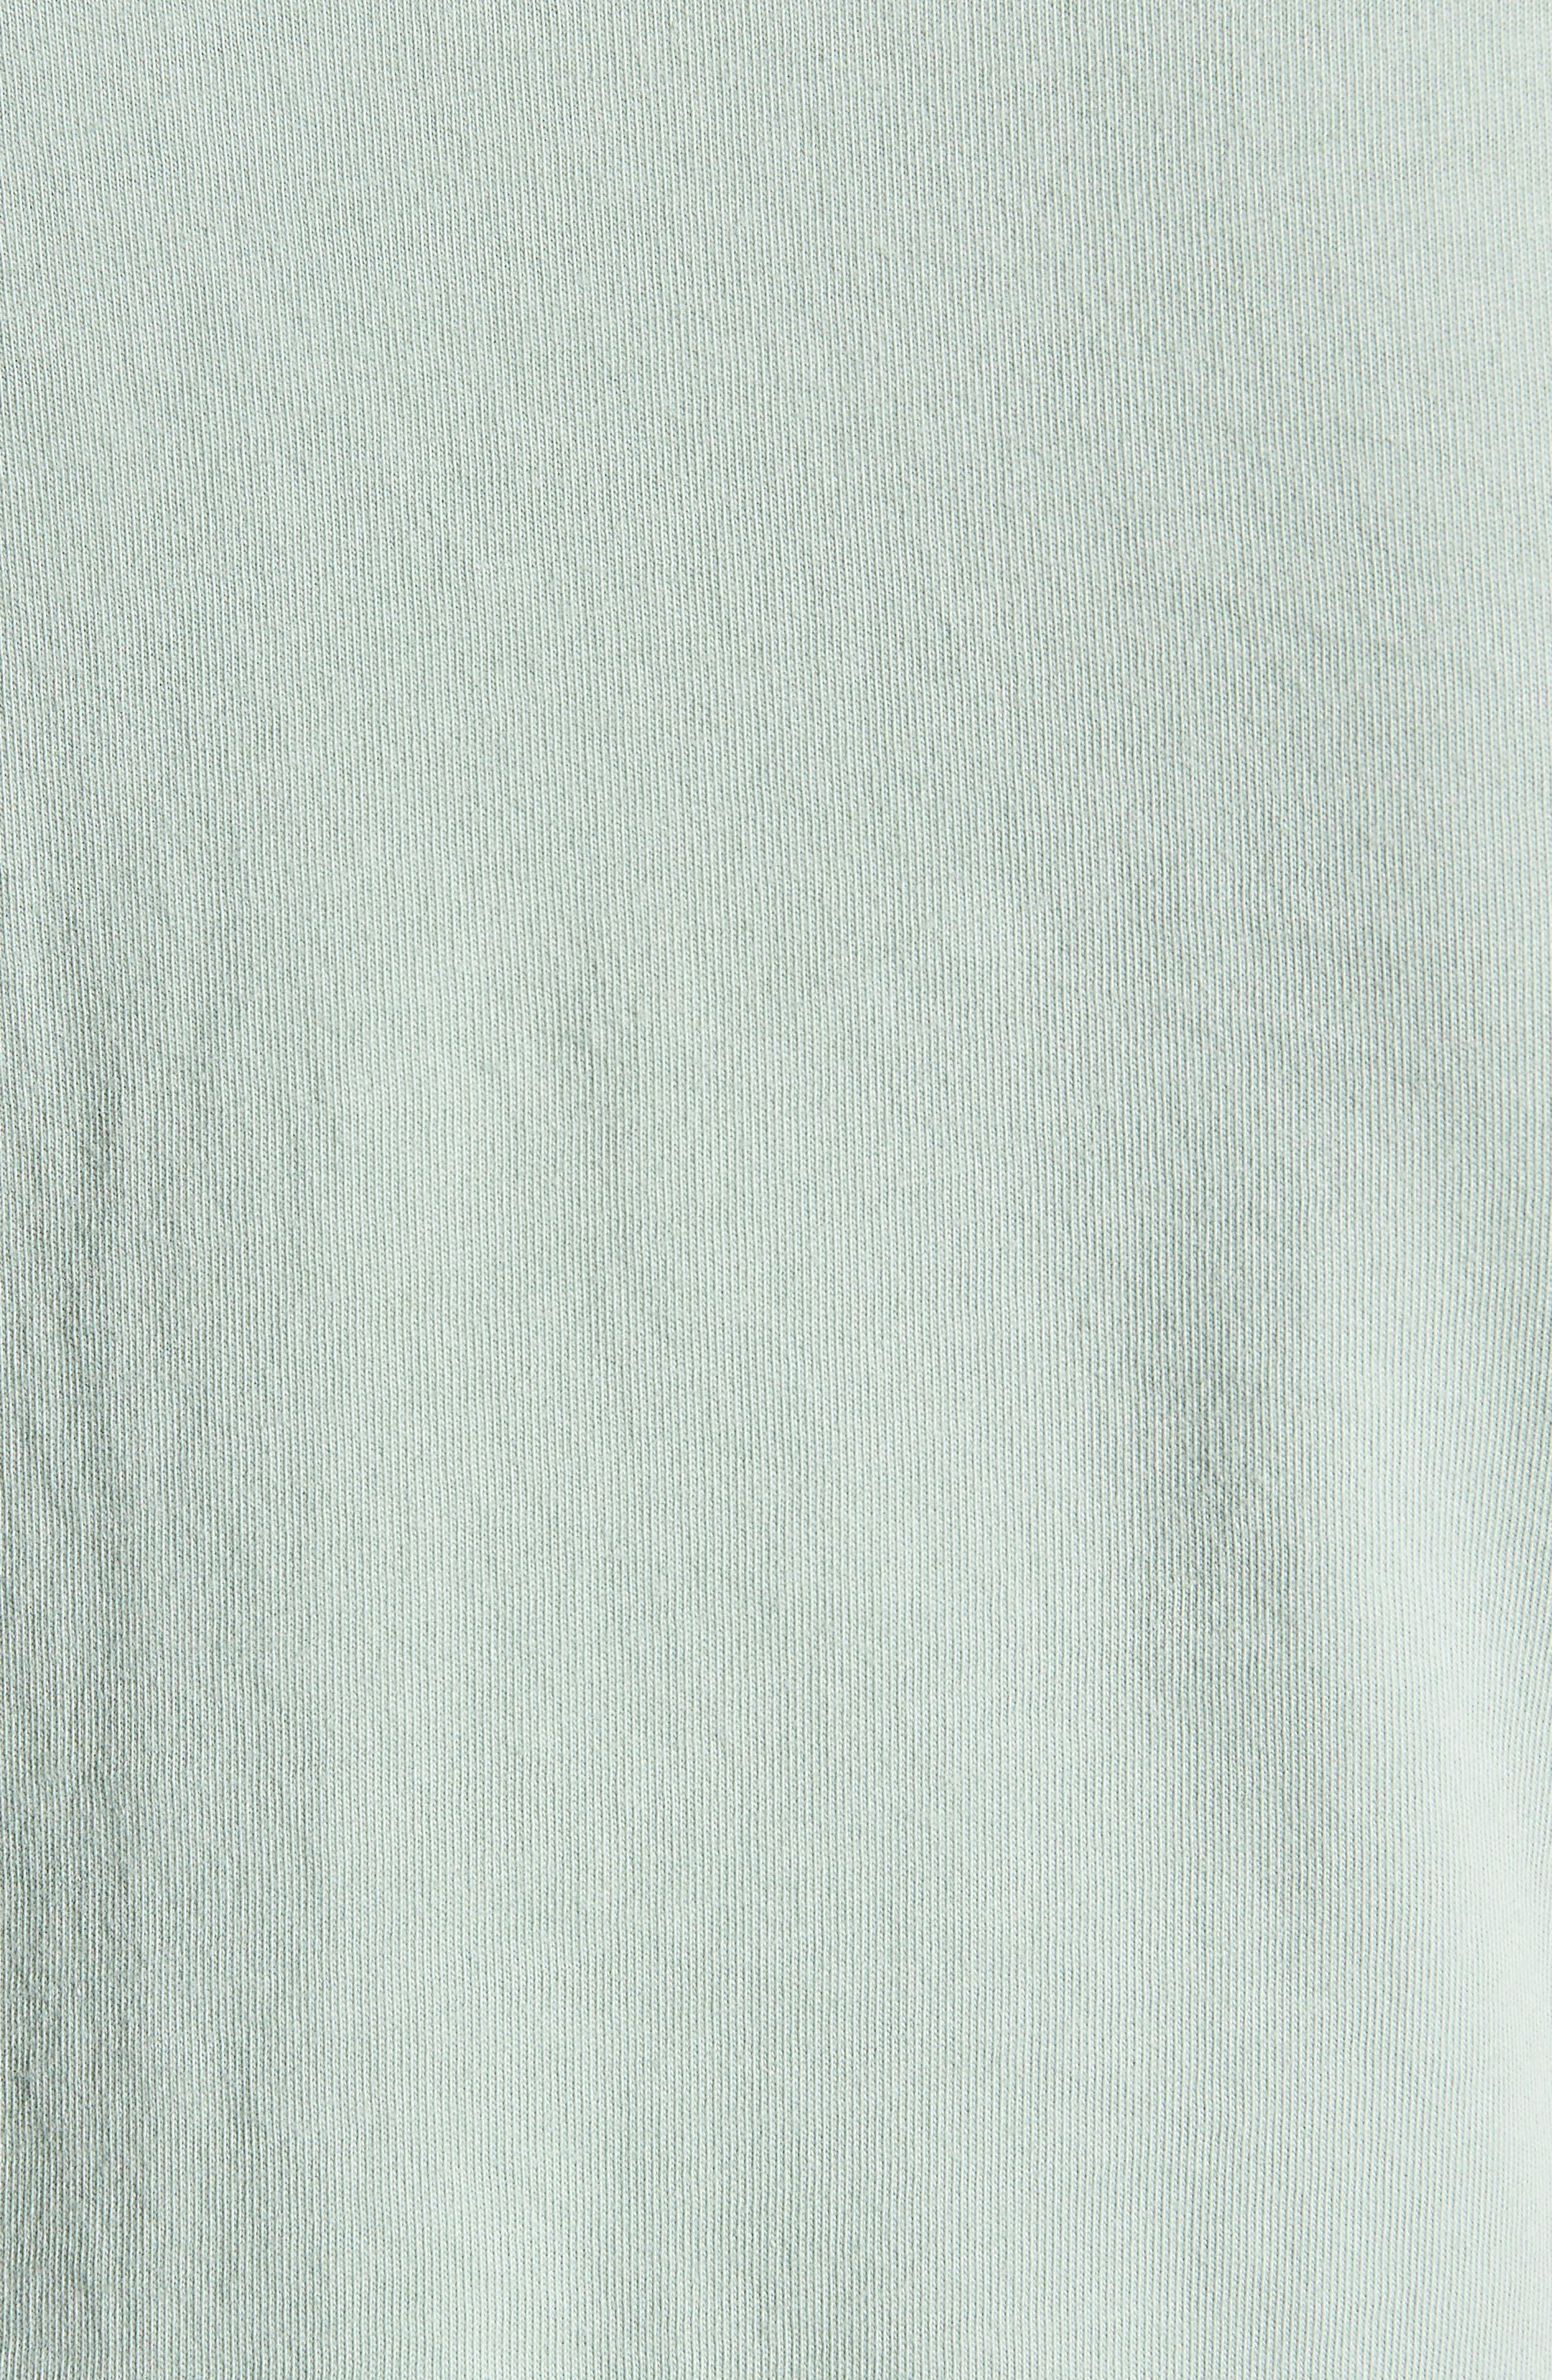 Muscle P Relaxed T-Shirt Dress,                             Alternate thumbnail 3, color,                             Light Moss